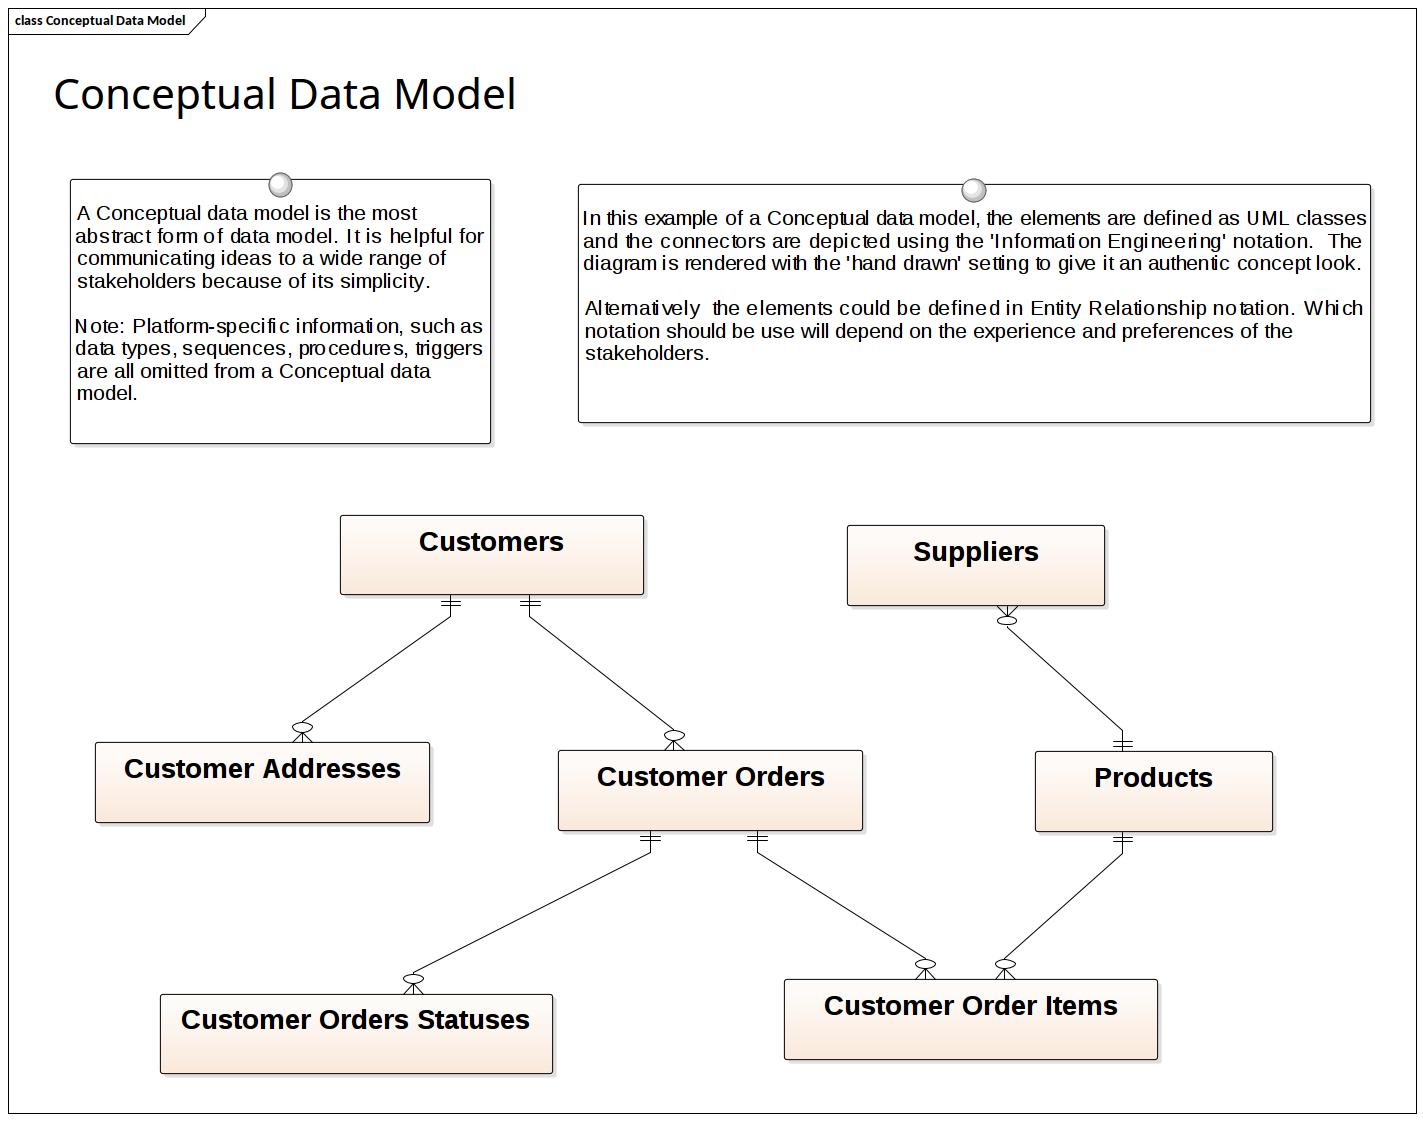 Data Modeling - Conceptual Data Model | Enterprise Architect inside Conceptual Data Model Entity Relationship Diagram